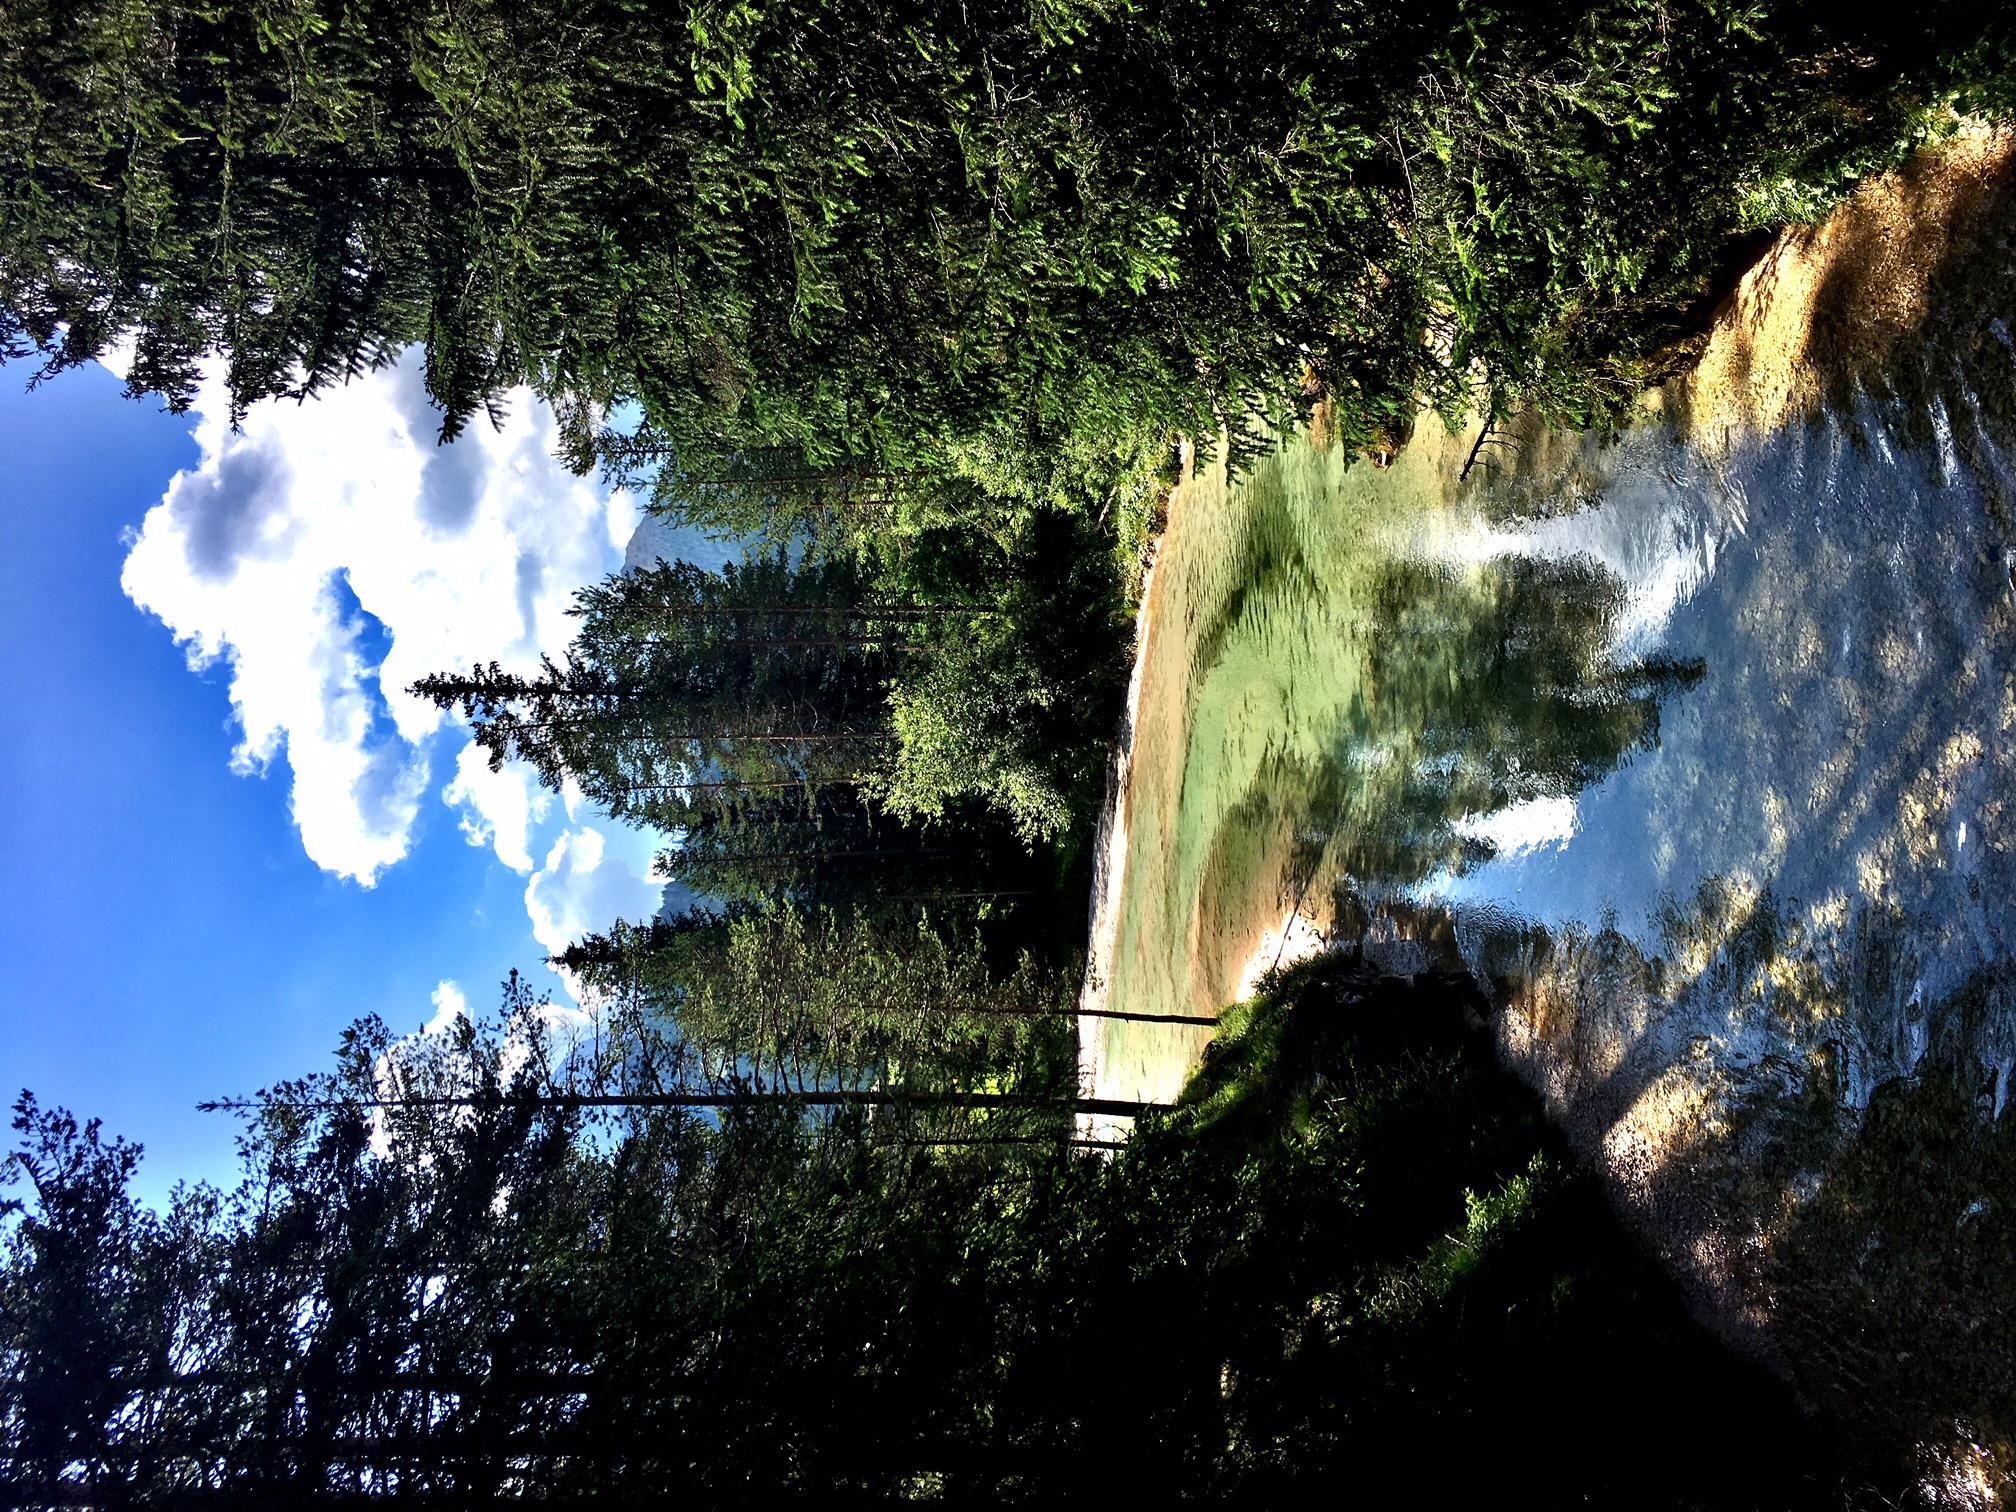 Mountain river at Armentarola (BZ)